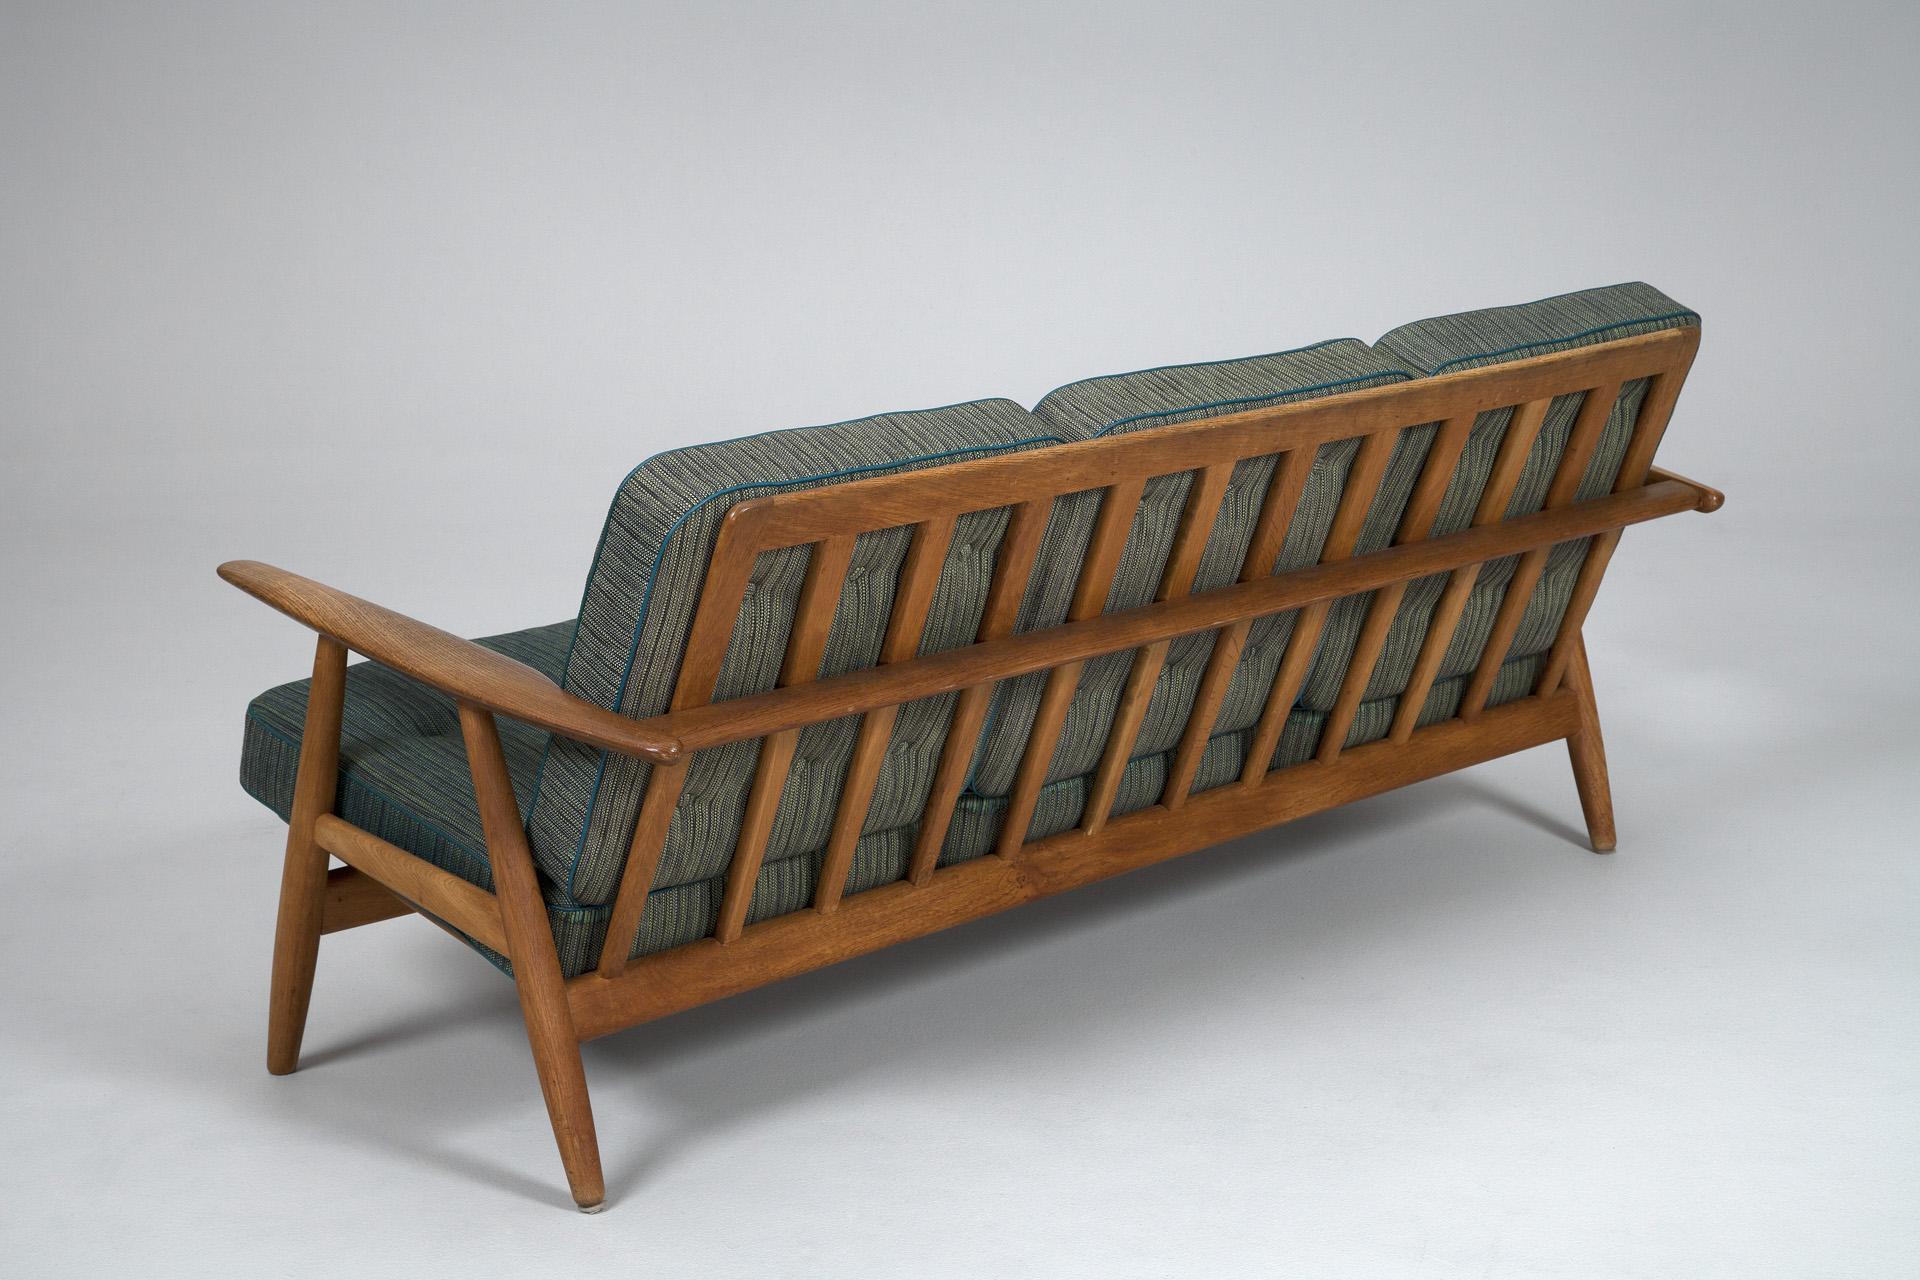 jacksons sofa hans j wegner. Black Bedroom Furniture Sets. Home Design Ideas